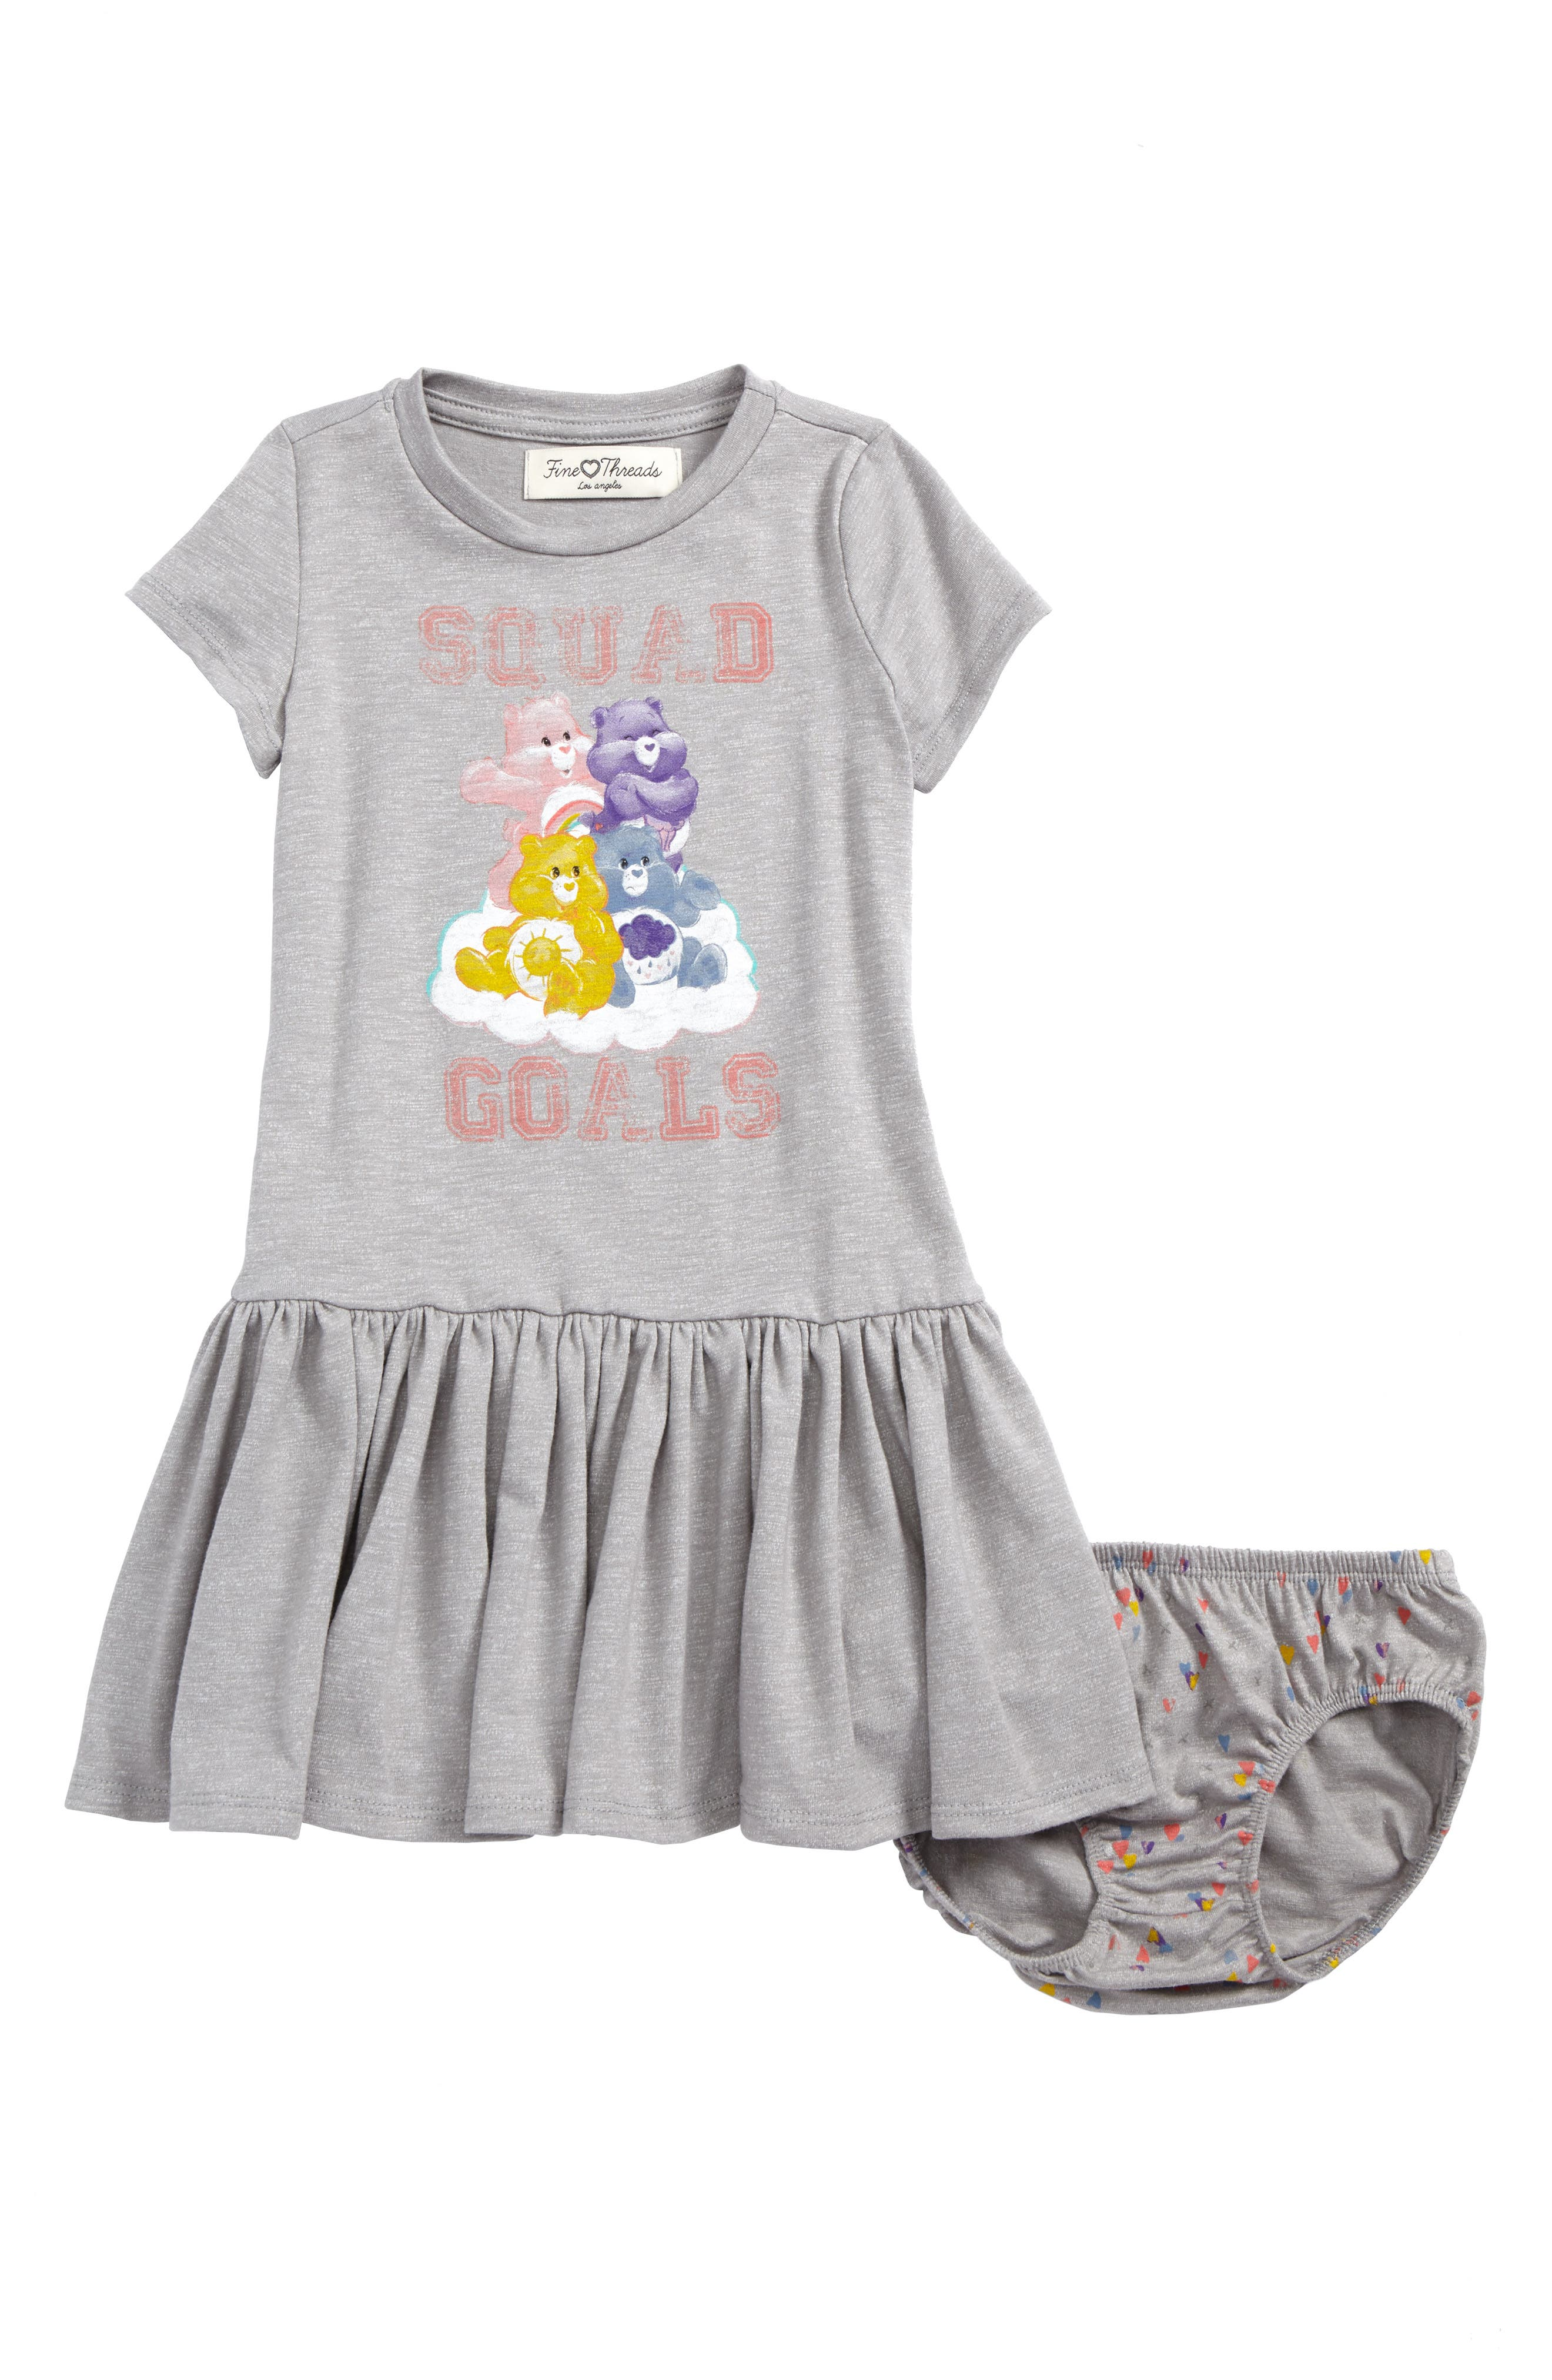 Main Image - Care Bears™ by Fine Threads Squad Goals Dress (Toddler Girls & Little Girls)